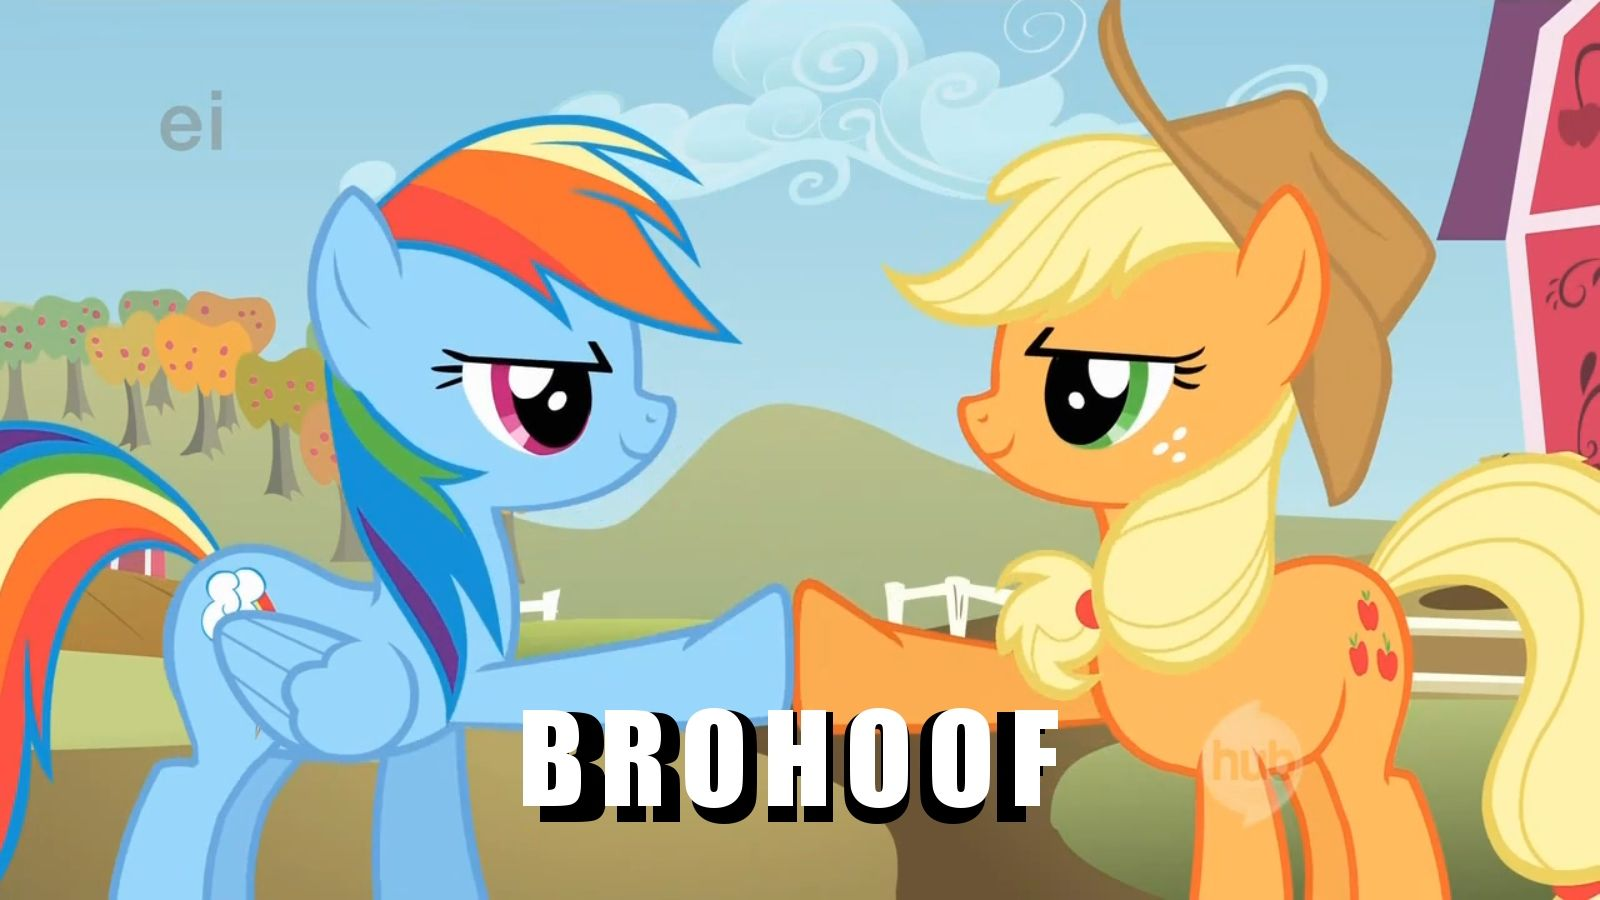 Brohoof!